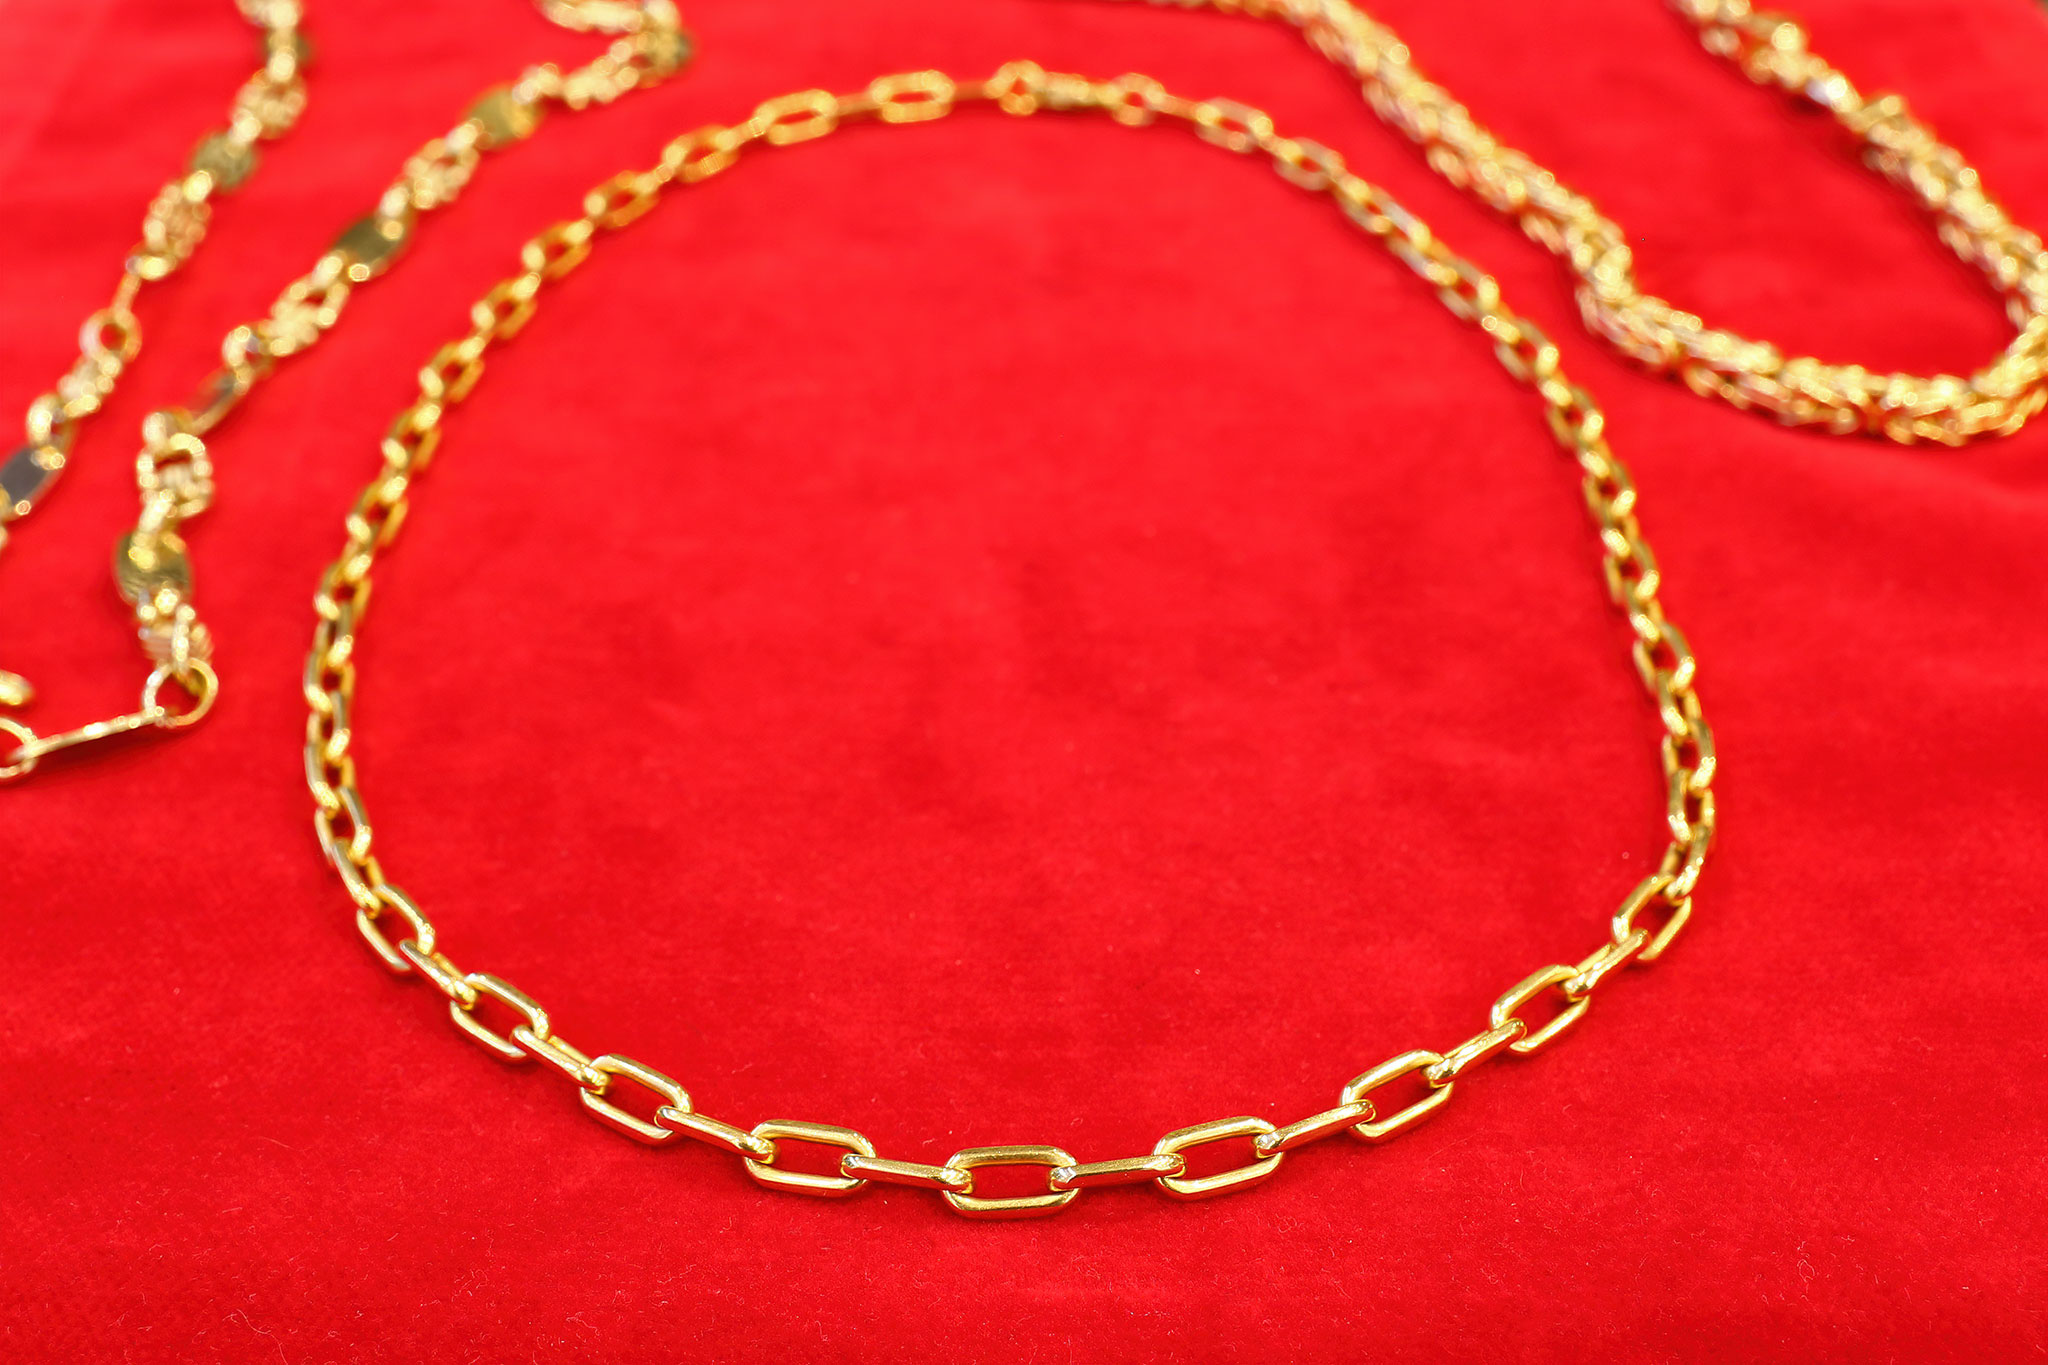 Edle Goldkette - Goldankauf Reutlingen